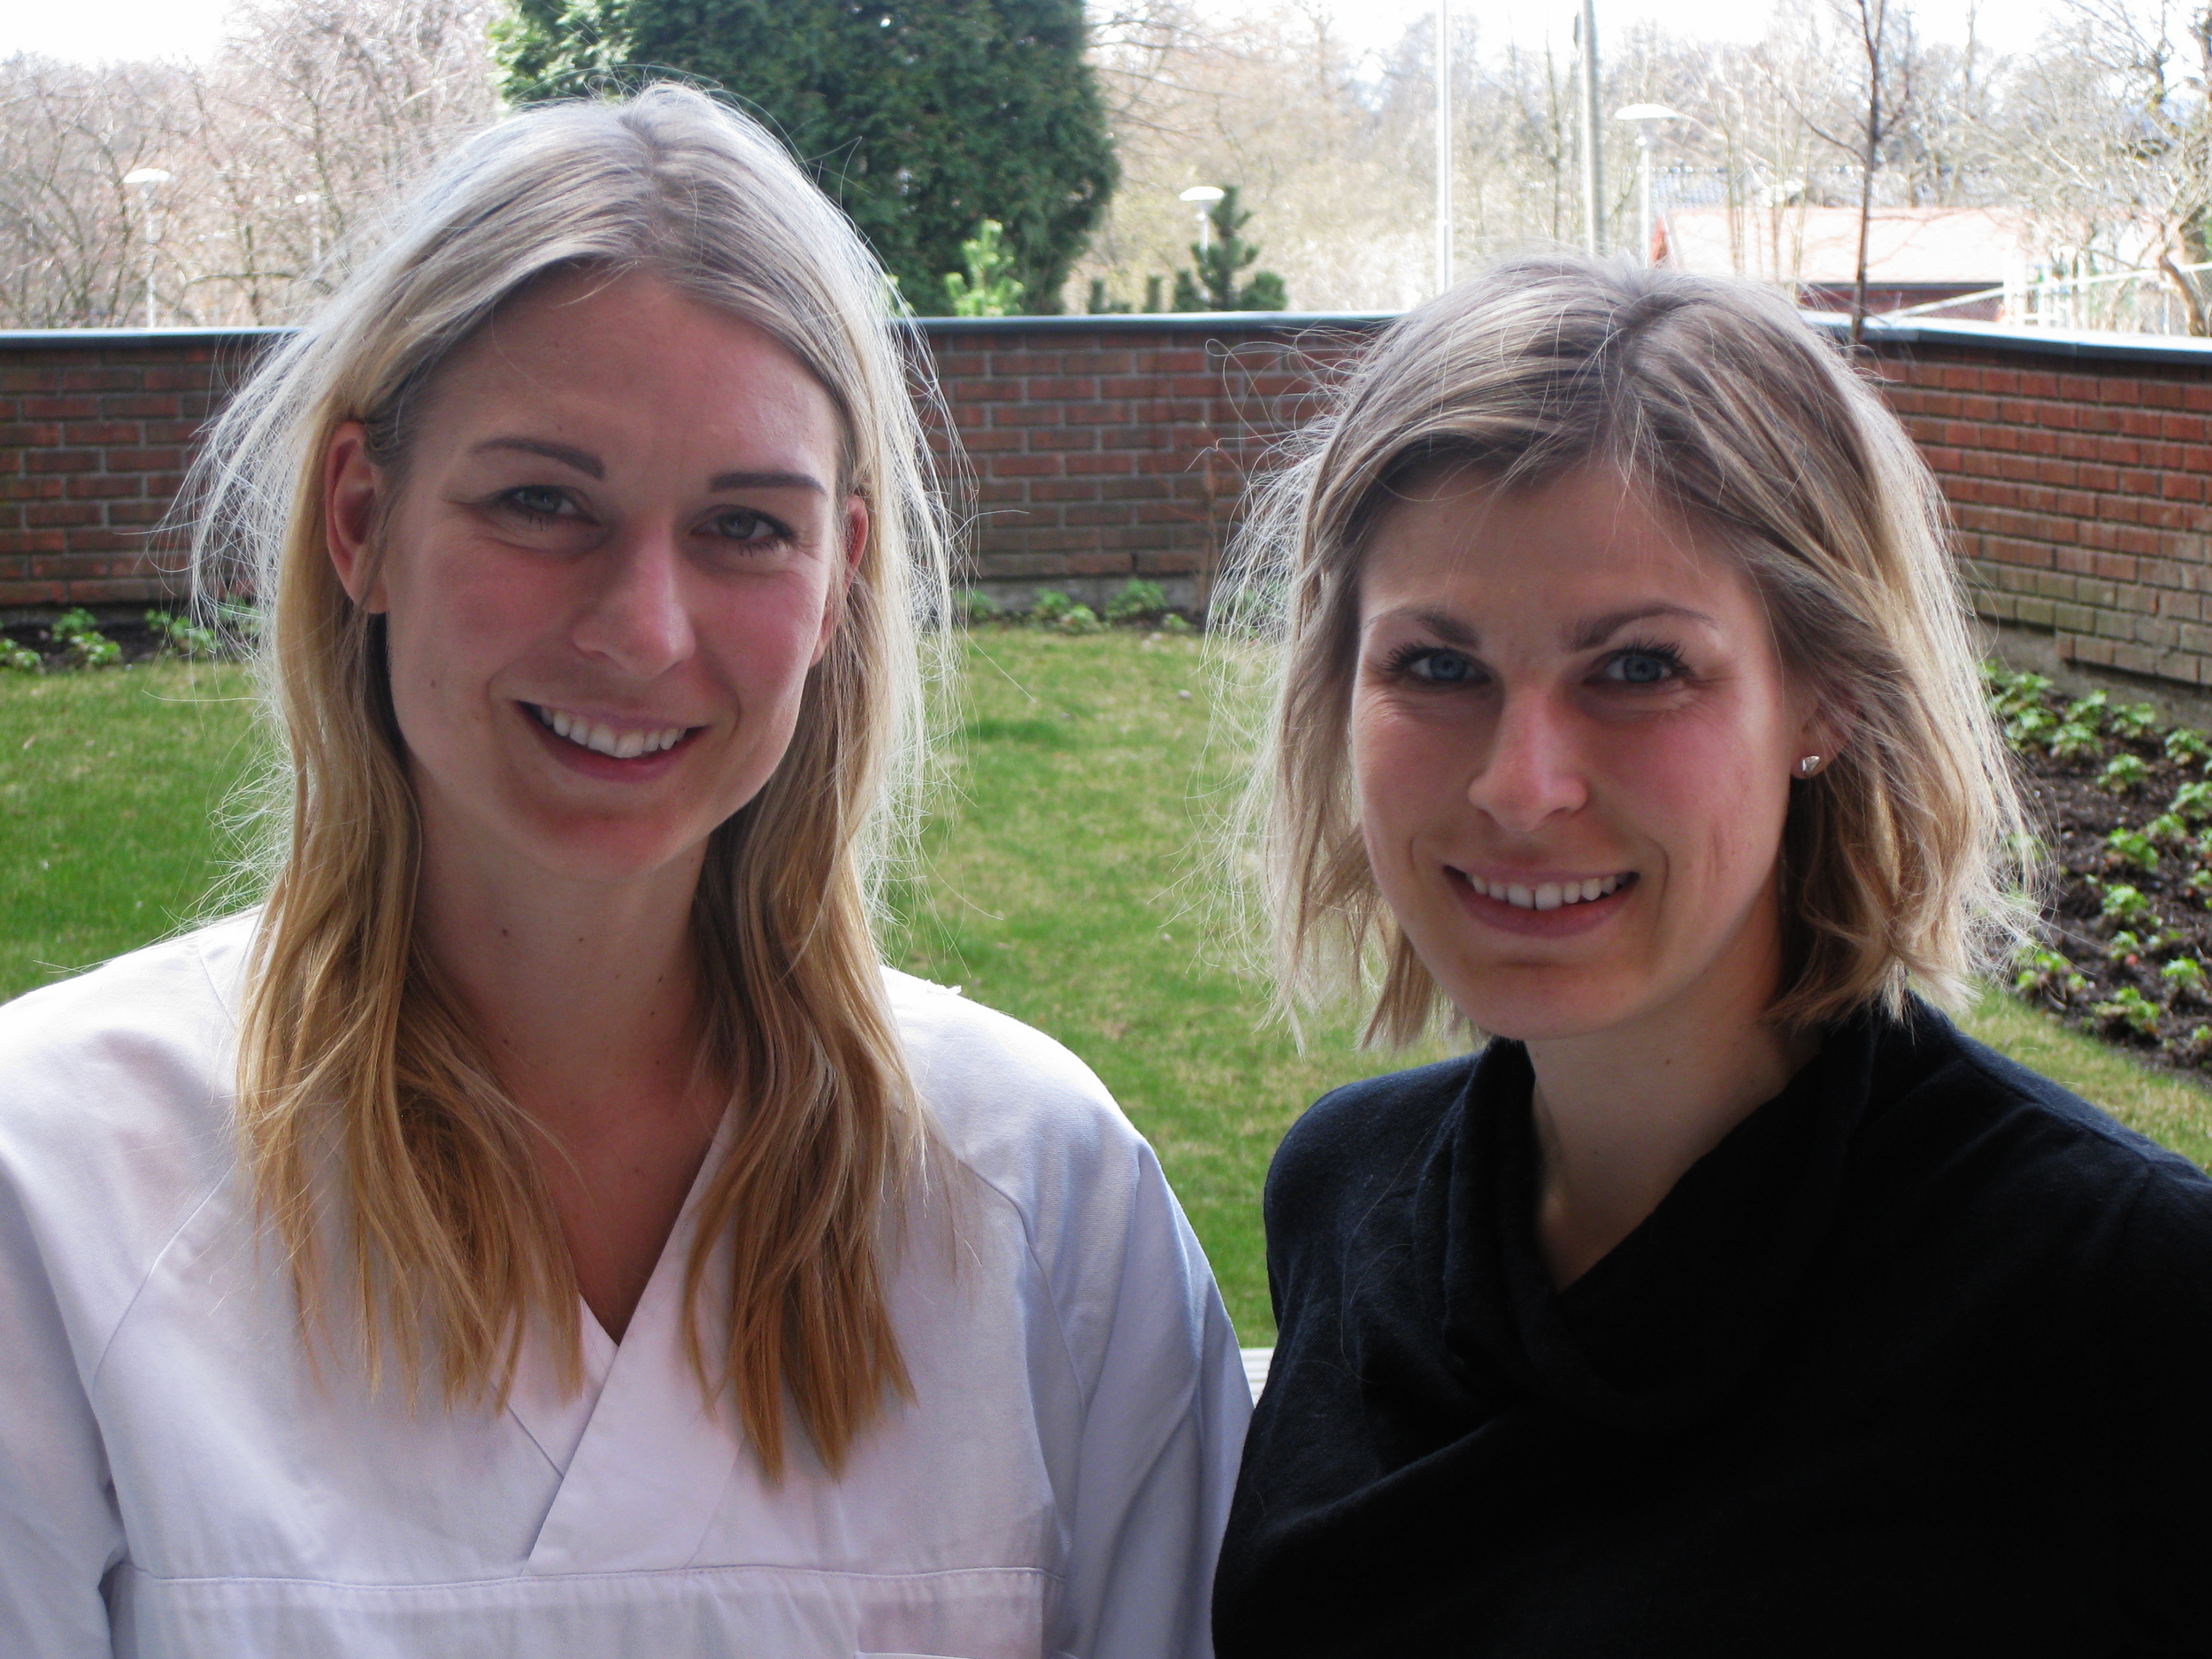 Ida K. Haugen og Karin Magnusson er klare til å starte innsamlingen i Nor-Hand studien ved Diakonhjemmet sykehus 20. april 2016. www.forskerlivet.no